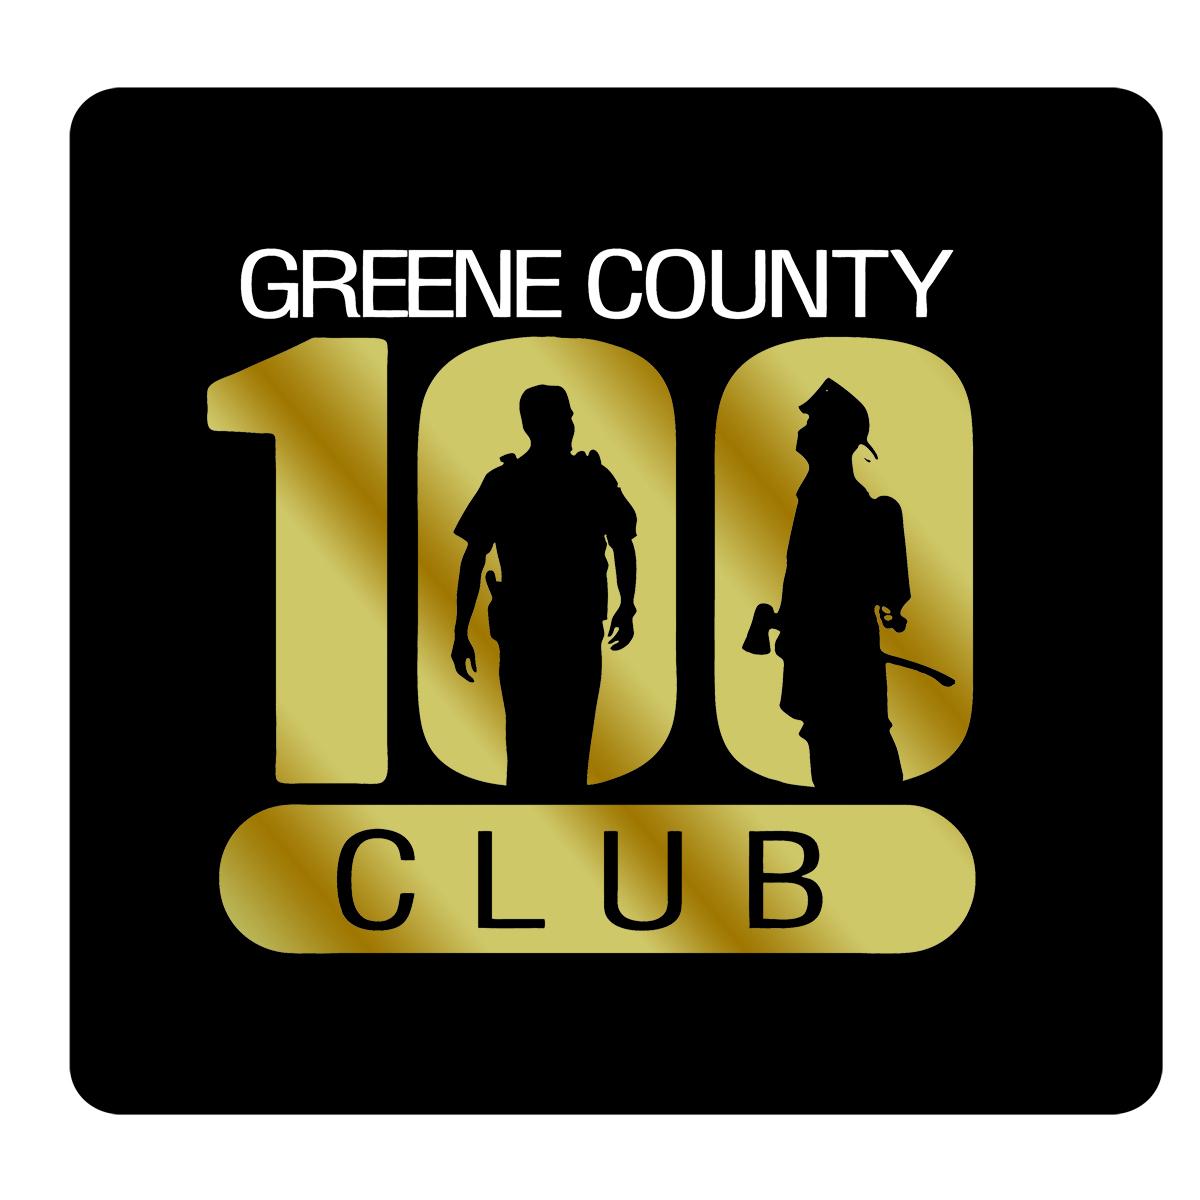 Greene County Sheriff's Office.